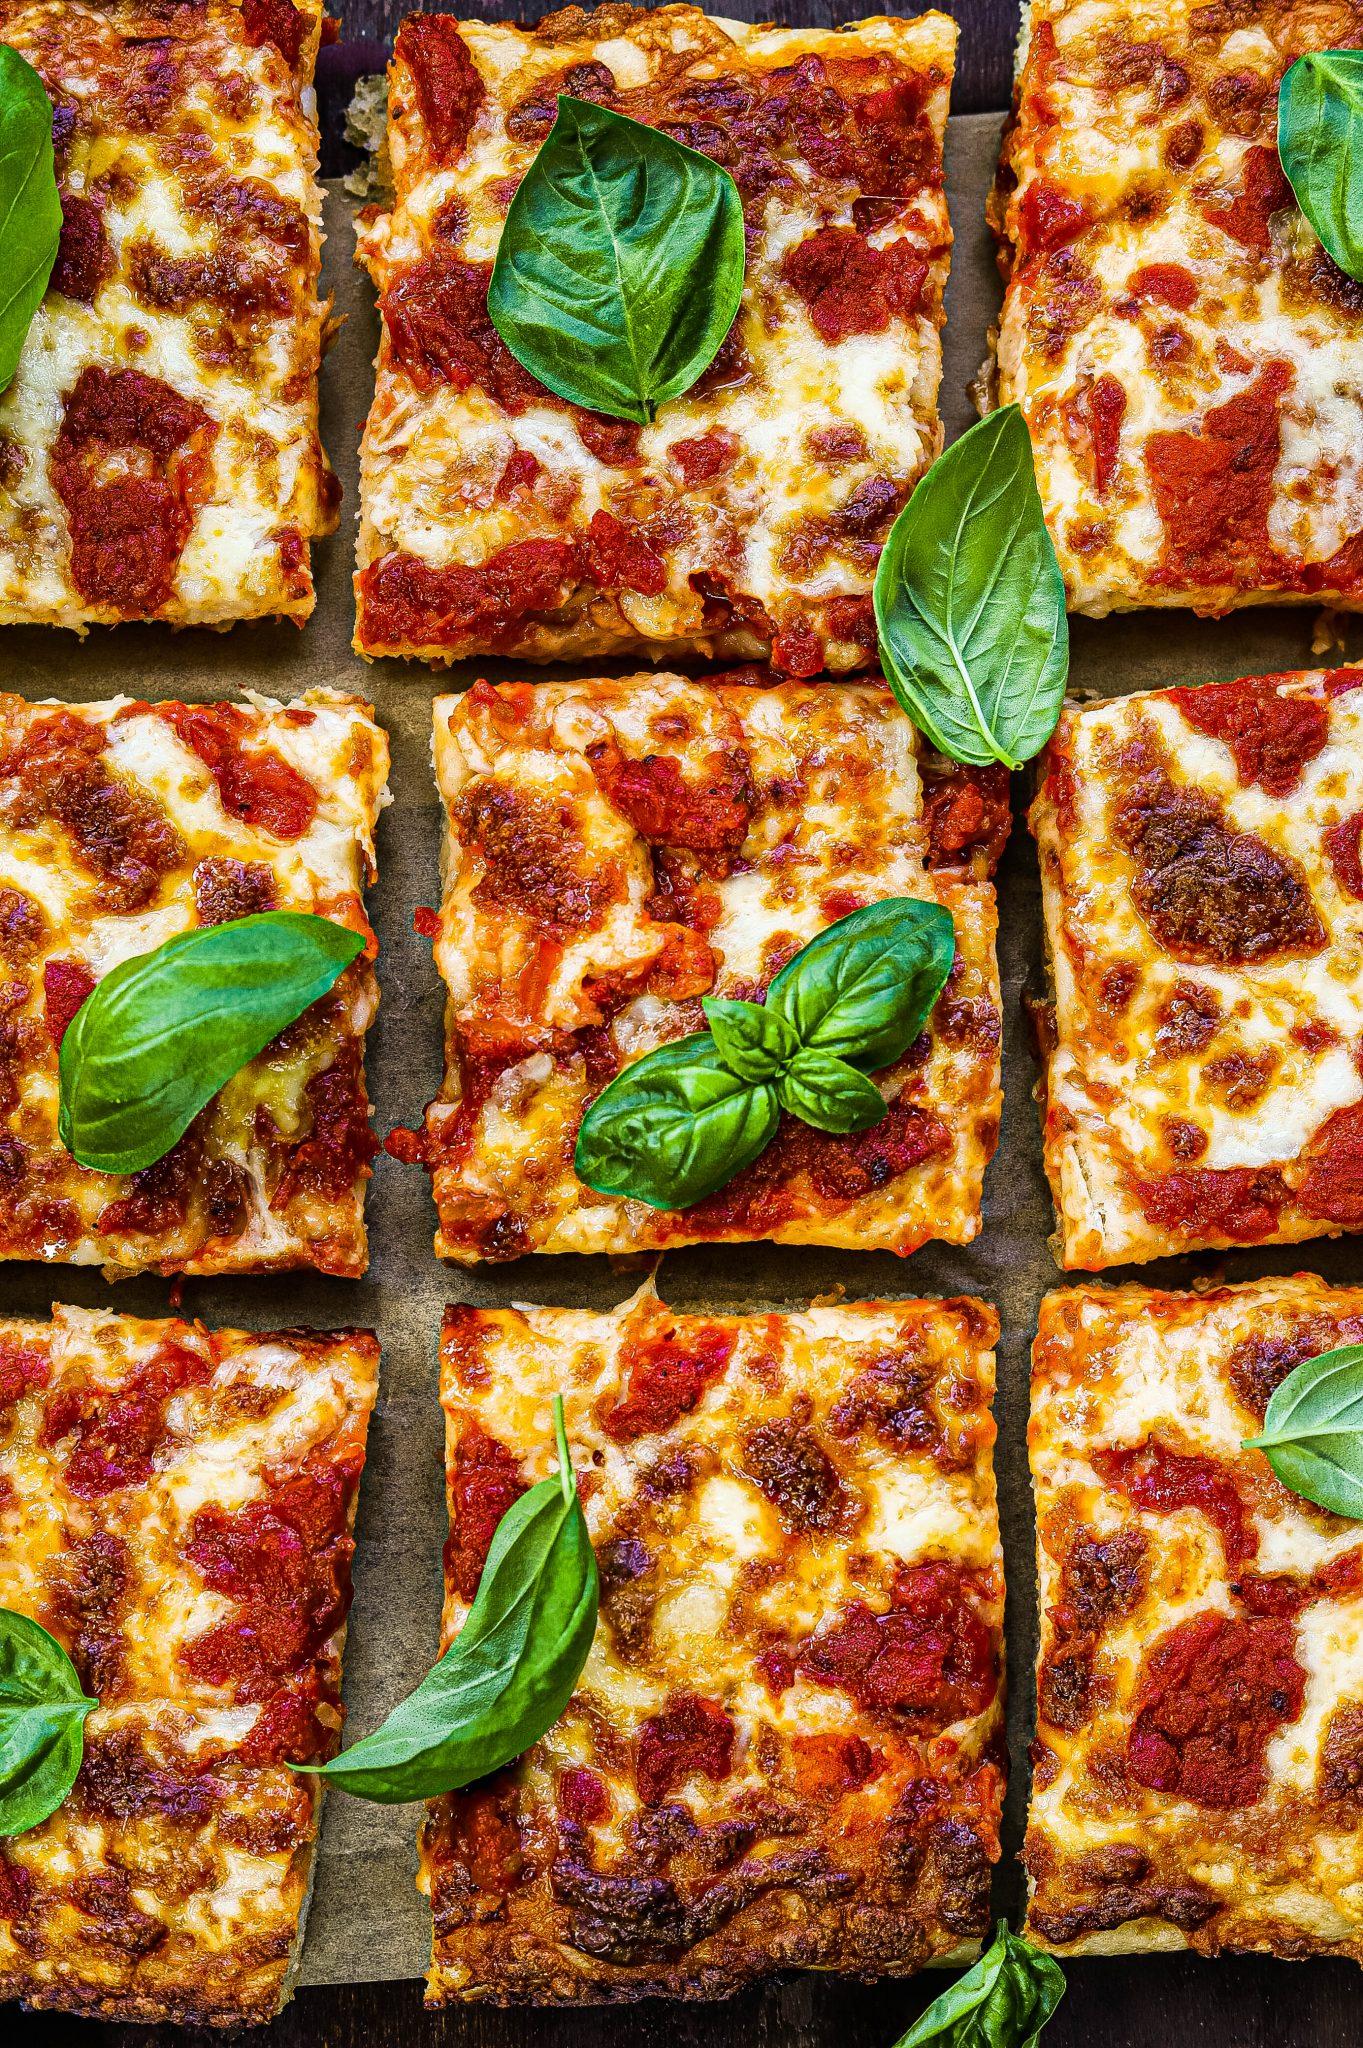 grandma style pizza